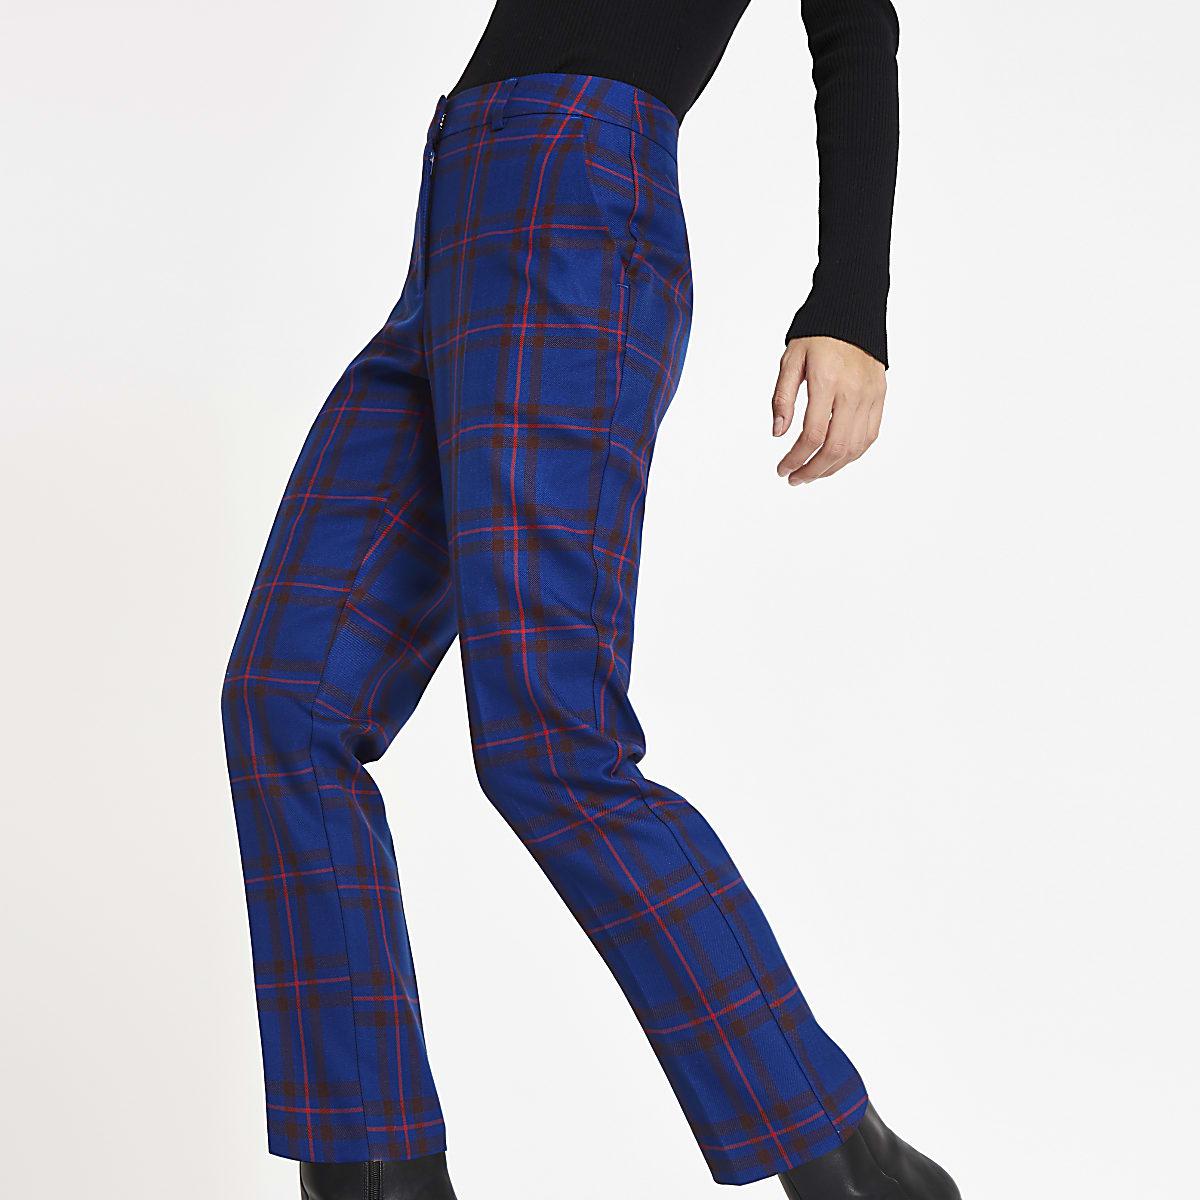 Dark blue plaid check cigarette pants